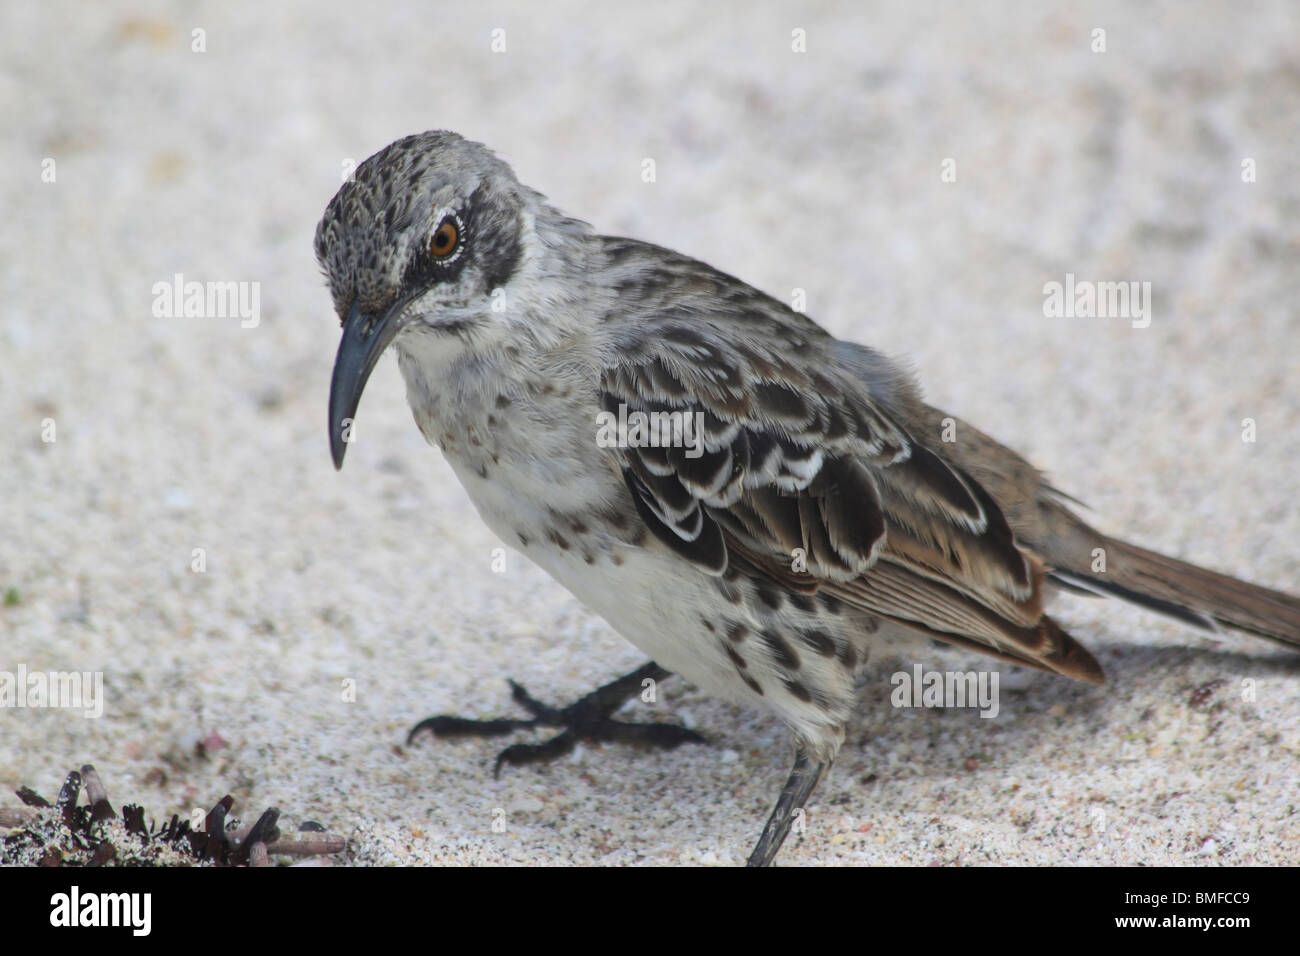 Mocking Bird on Galapagos Islands - Stock Image